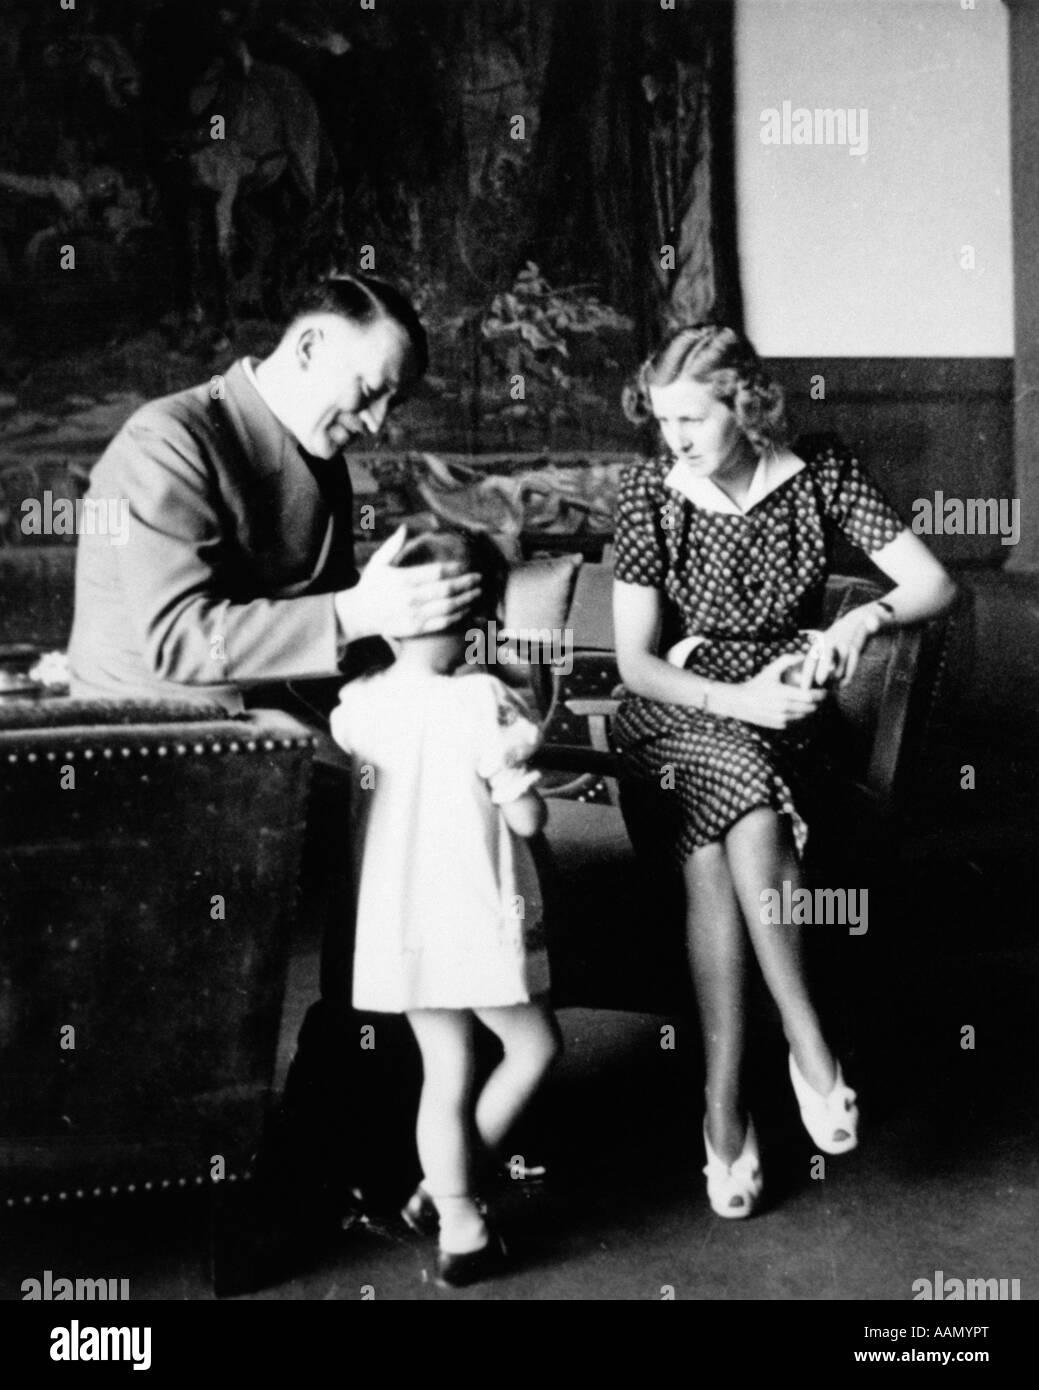 1940s ADOLPH HITLER EVA BRAUN AND USCHI IN STUDY AT BERCHTESGADEN BERCHTESGADEN RETREAT IN BAVARIA - Stock Image